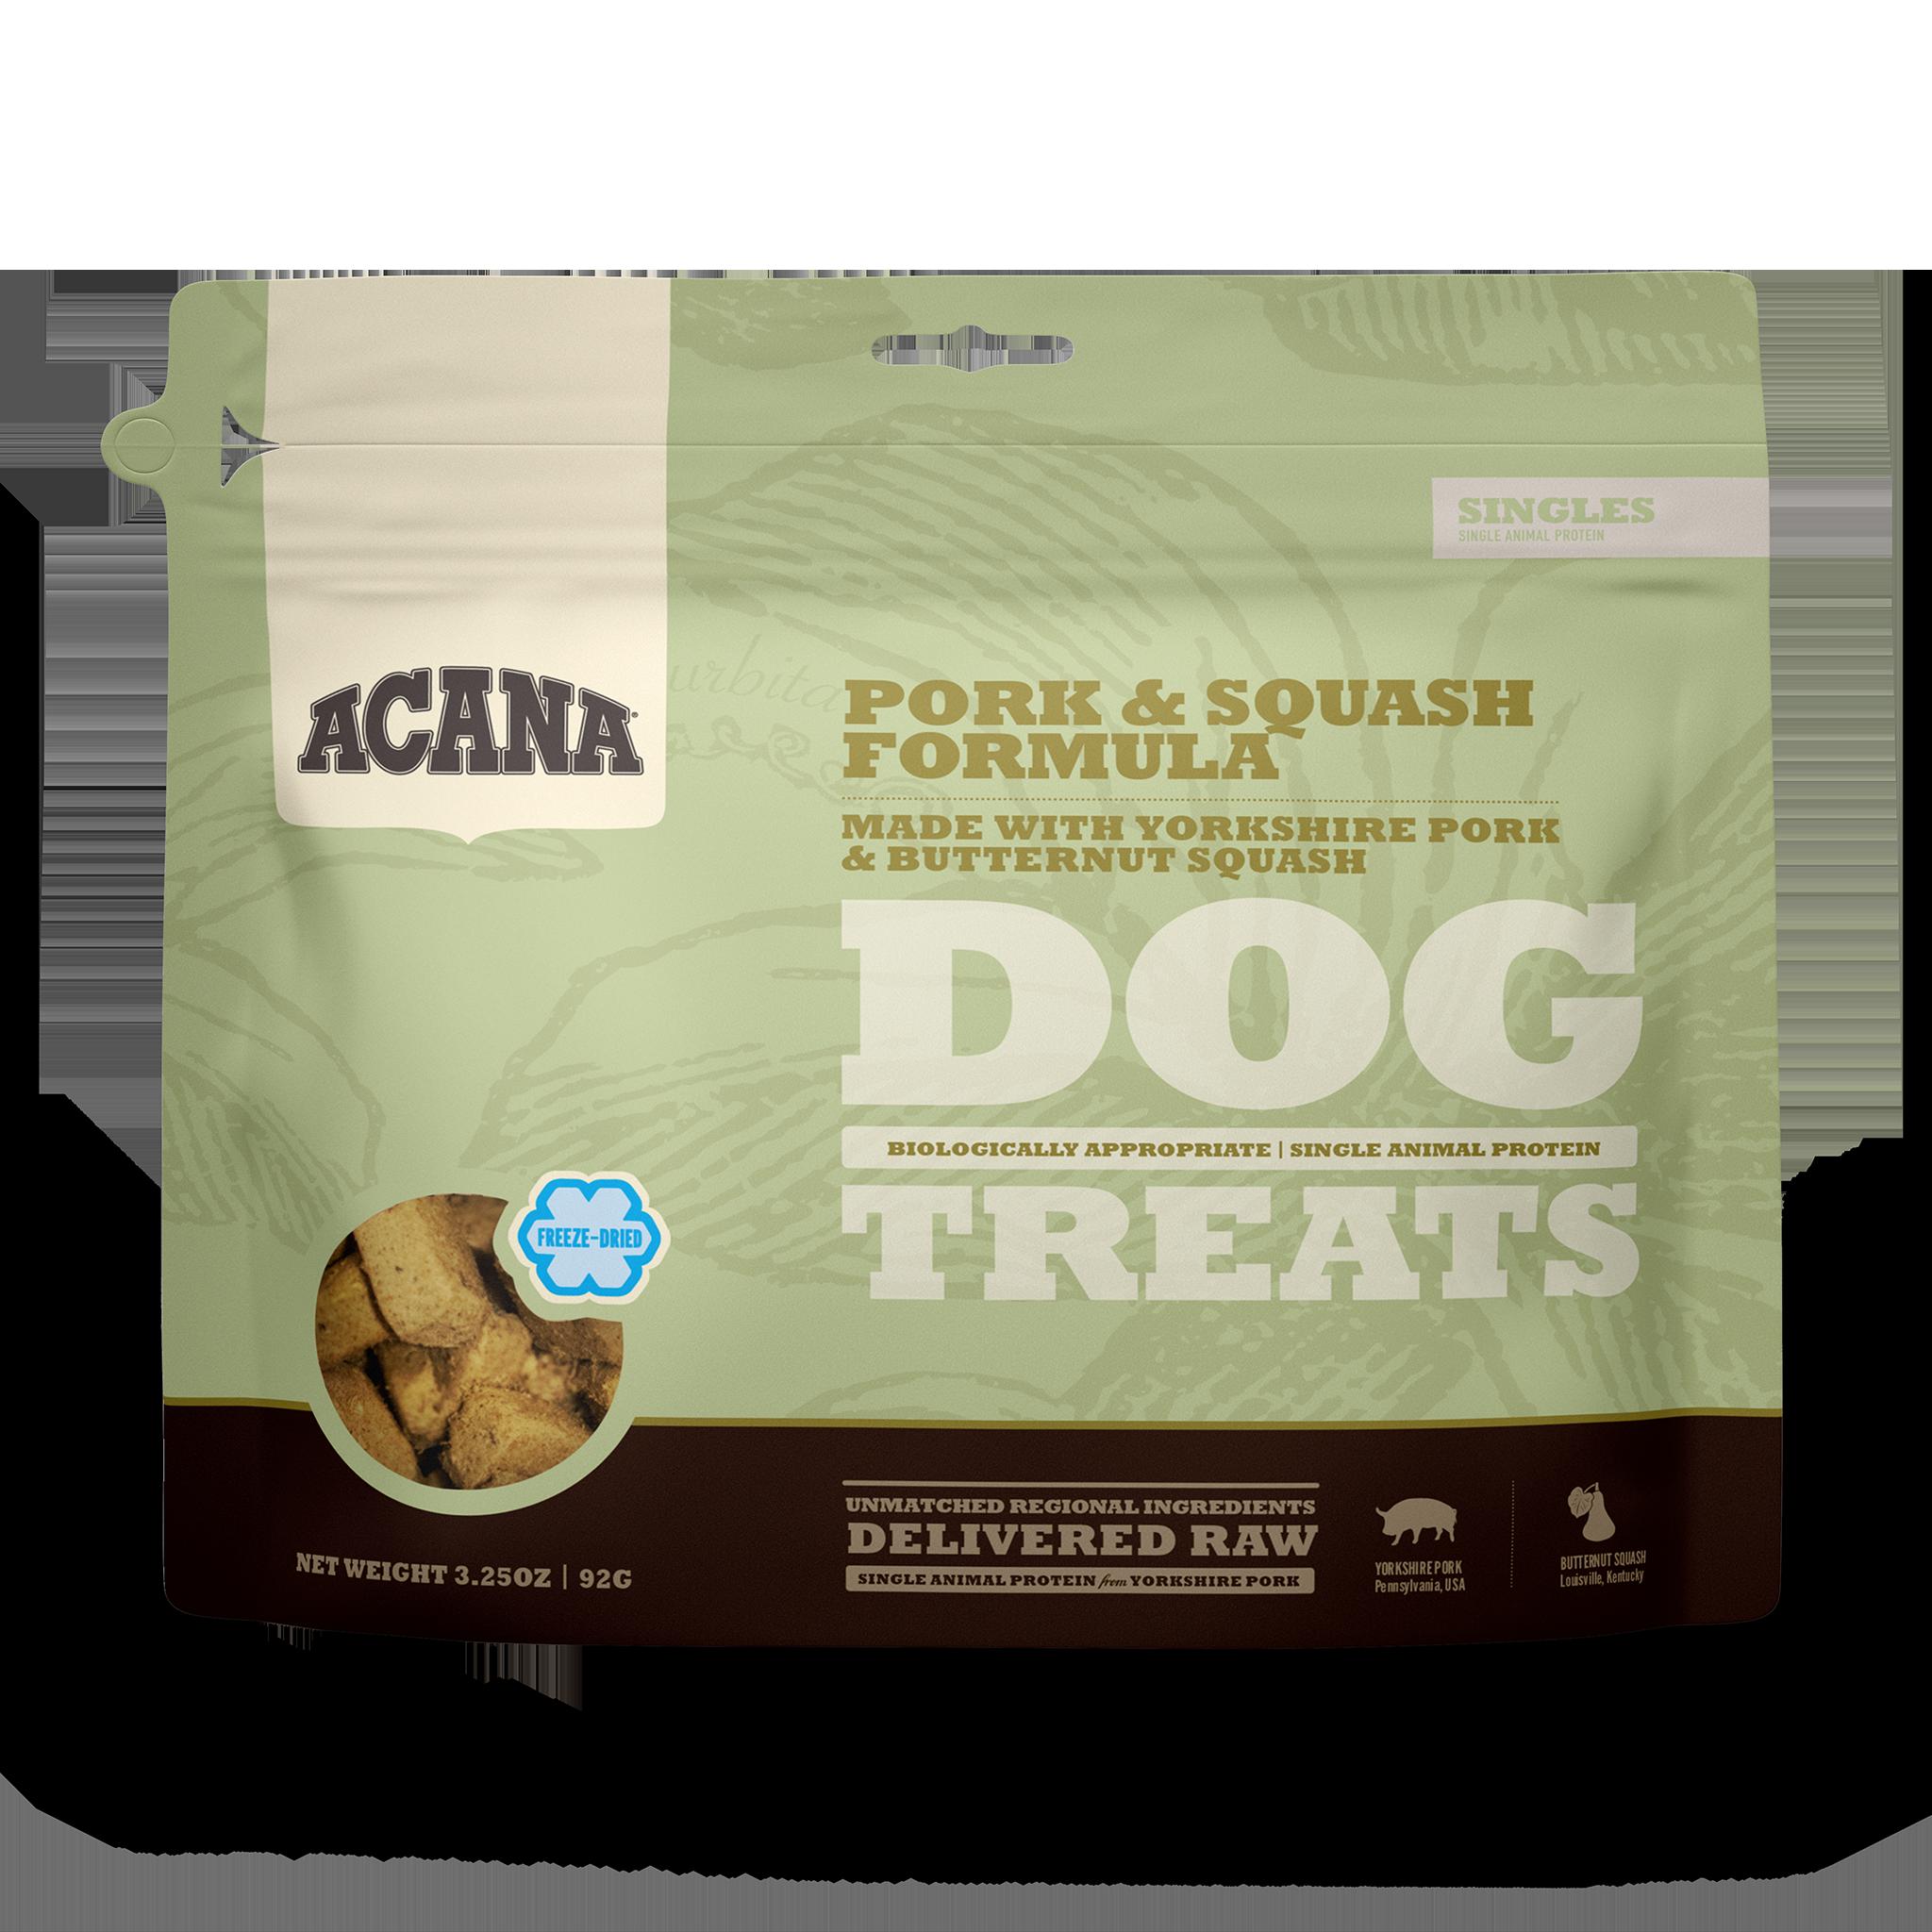 Acana Acana Freeze Dried Pork & Squash  Dog Treat 3.25oz